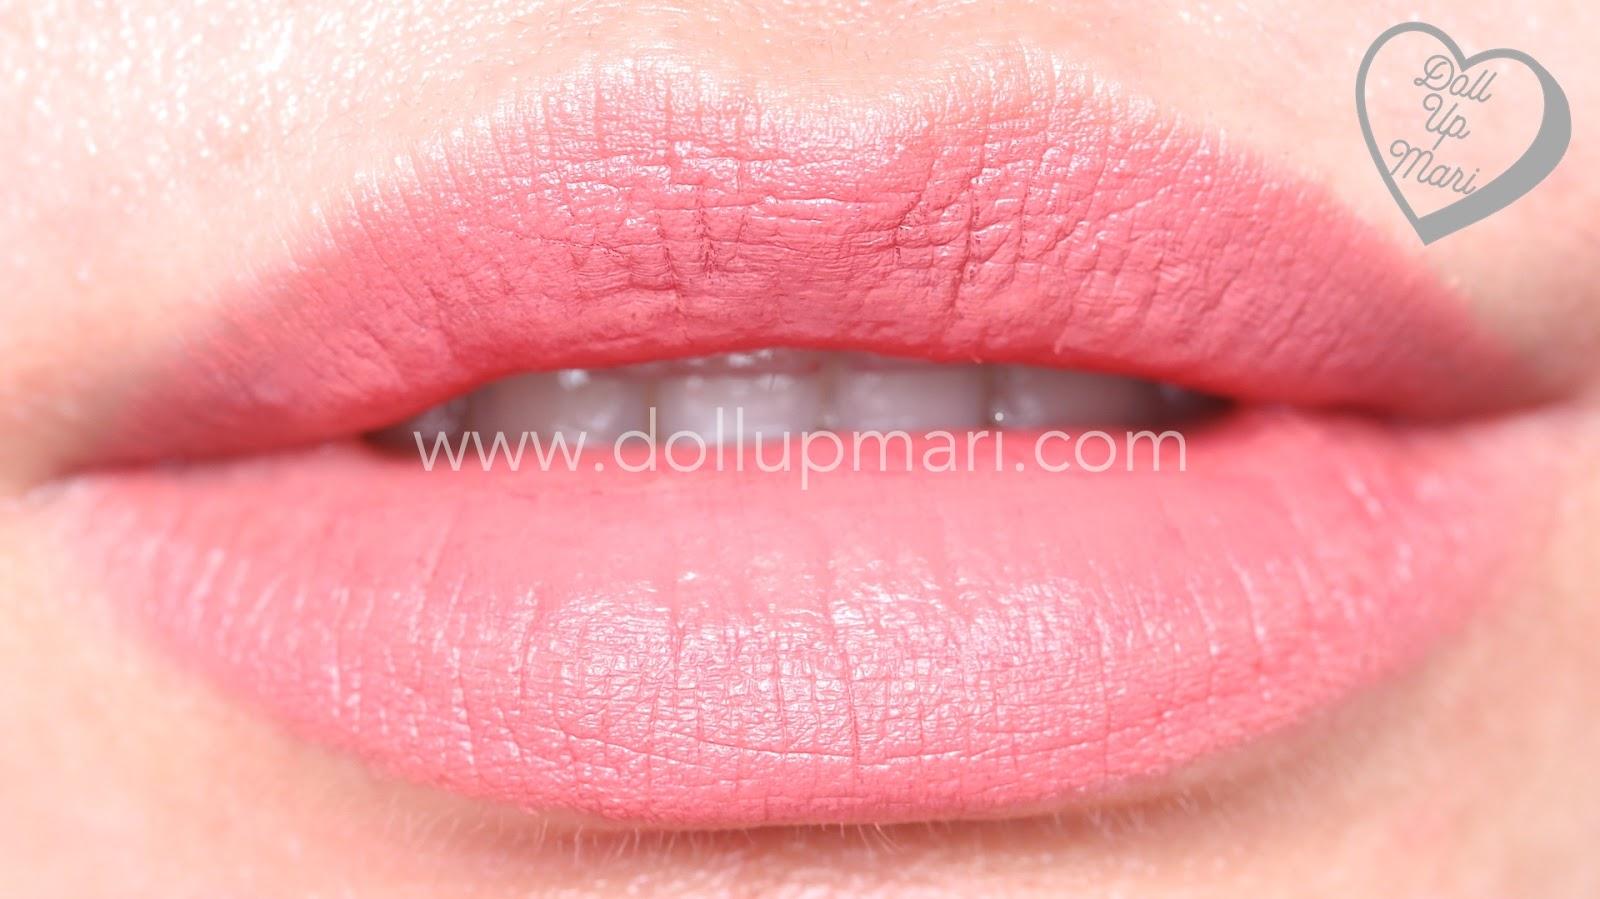 lip swatch of Silkygirl OMG! Powder Matte Lipcolor Lipstick (01-Blossom)